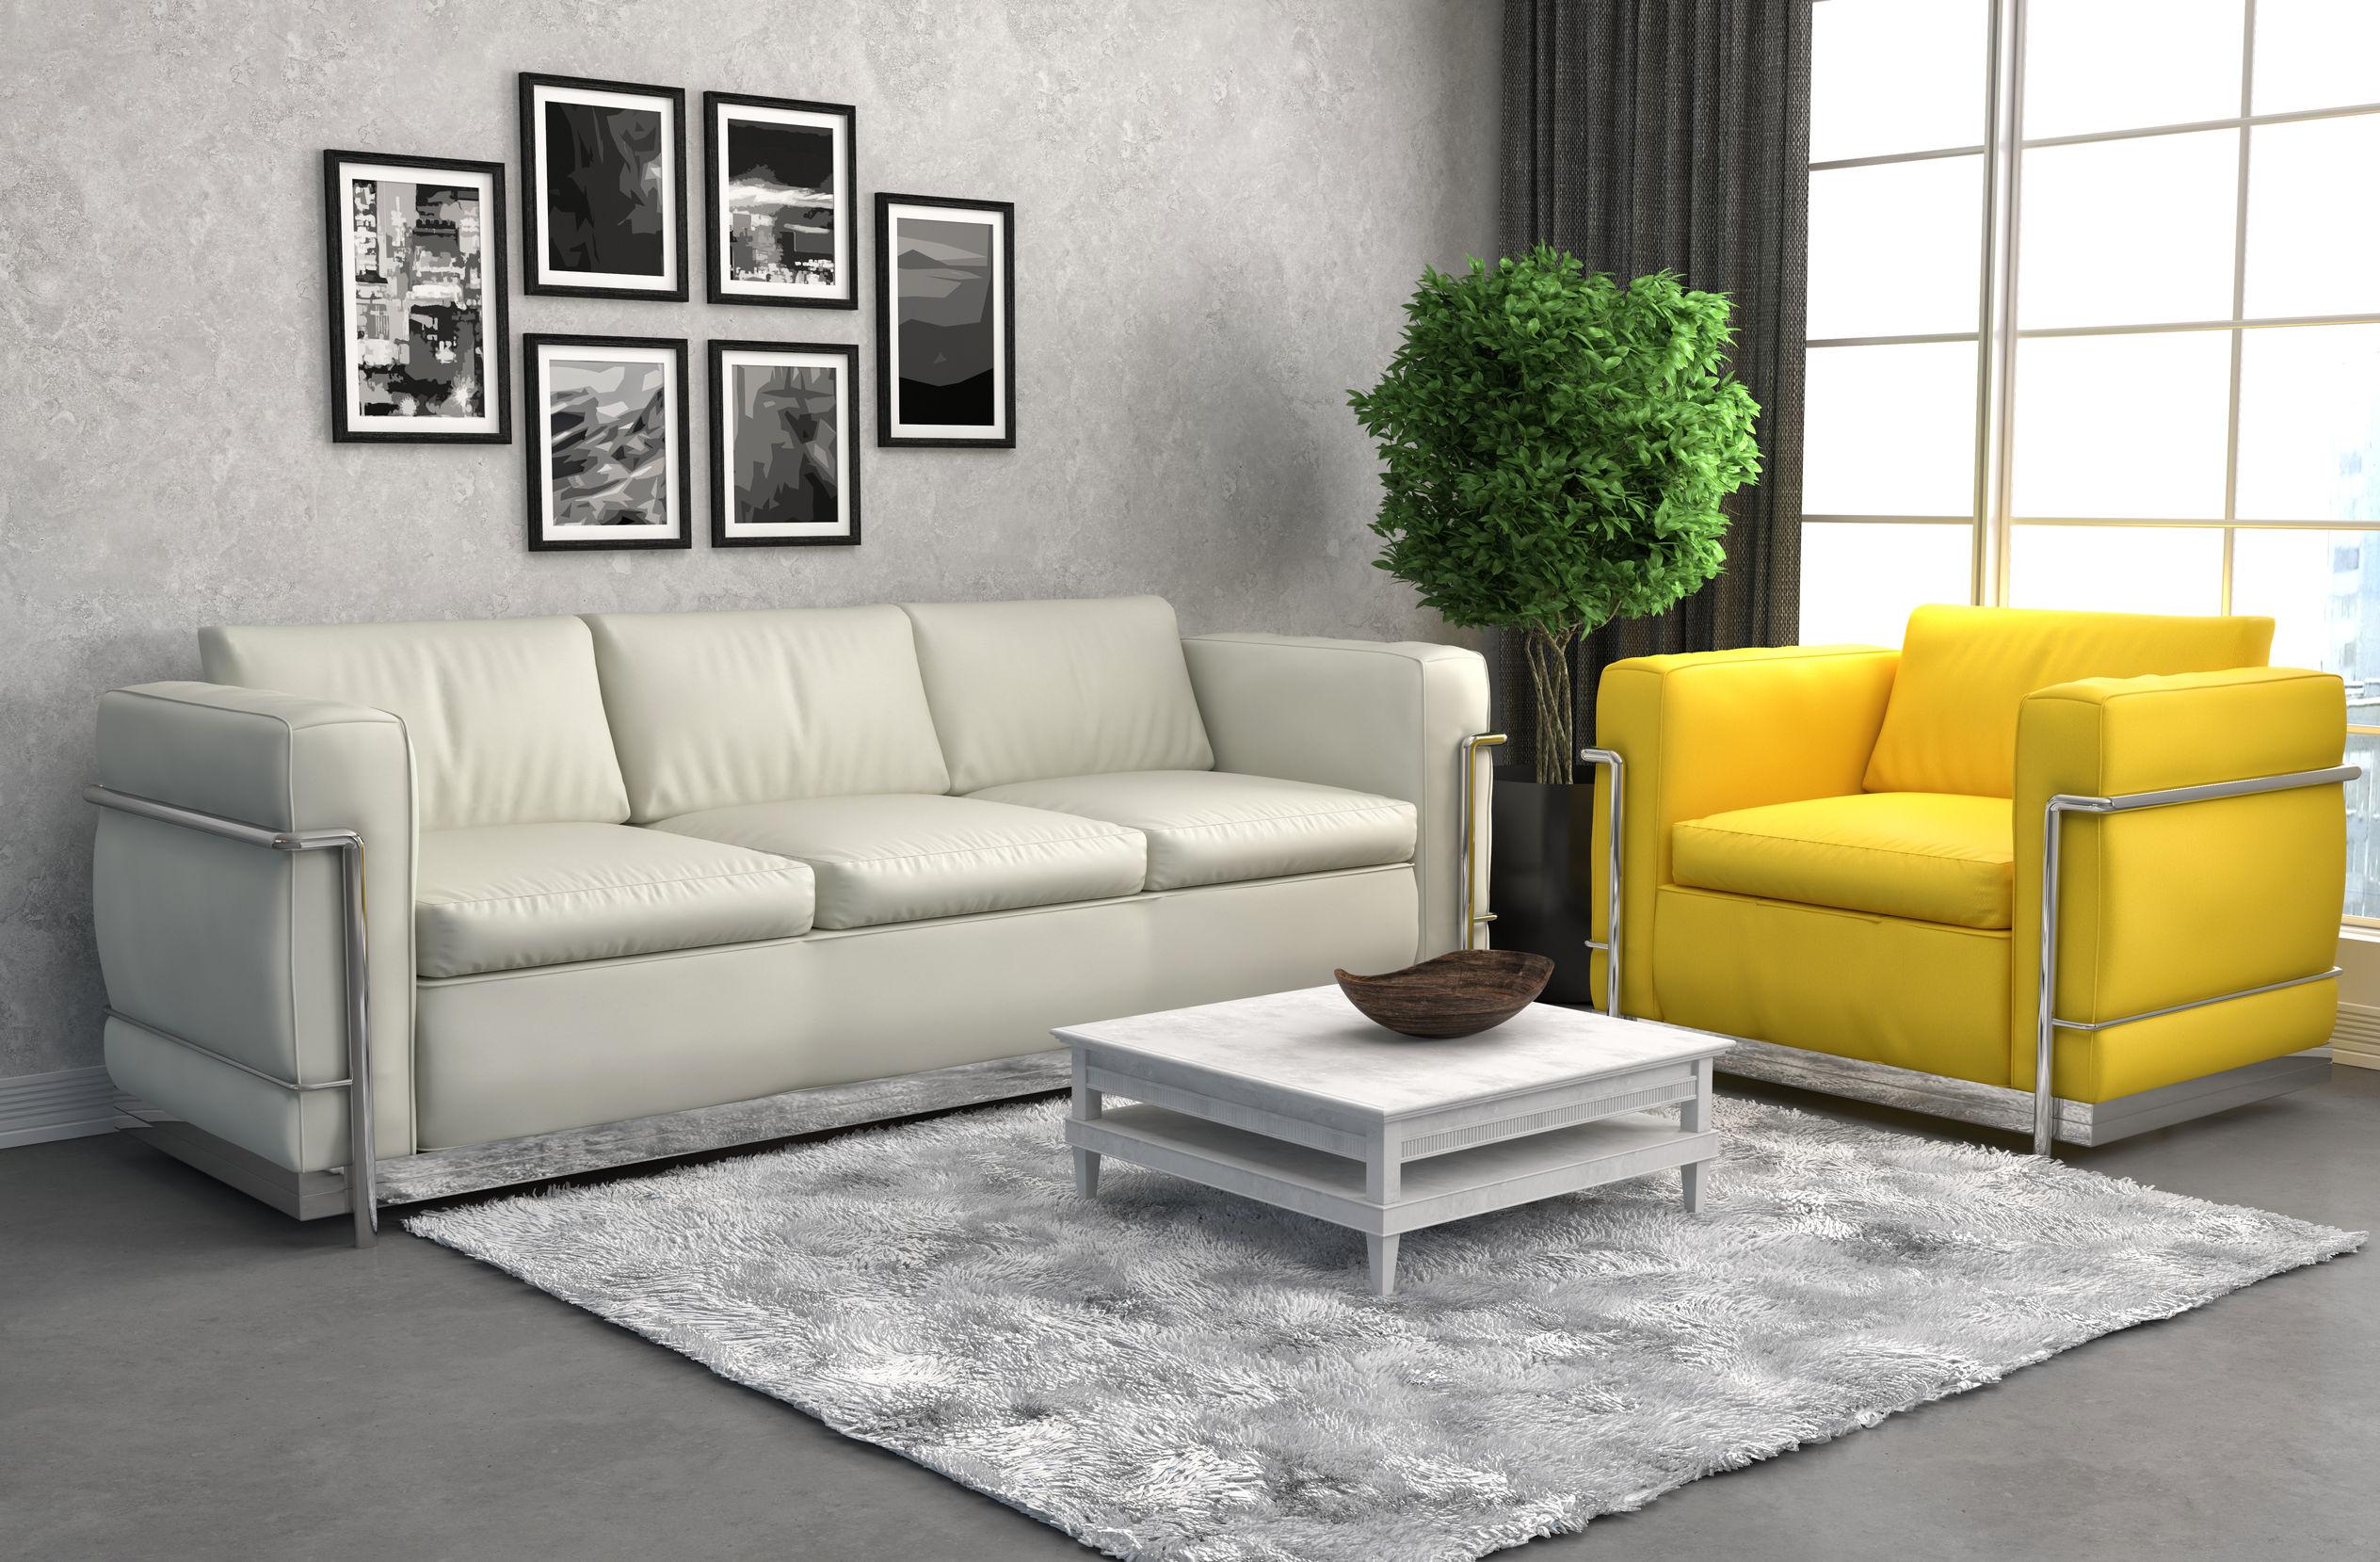 tendance d co printemps t 2017 le mag visiondeco. Black Bedroom Furniture Sets. Home Design Ideas